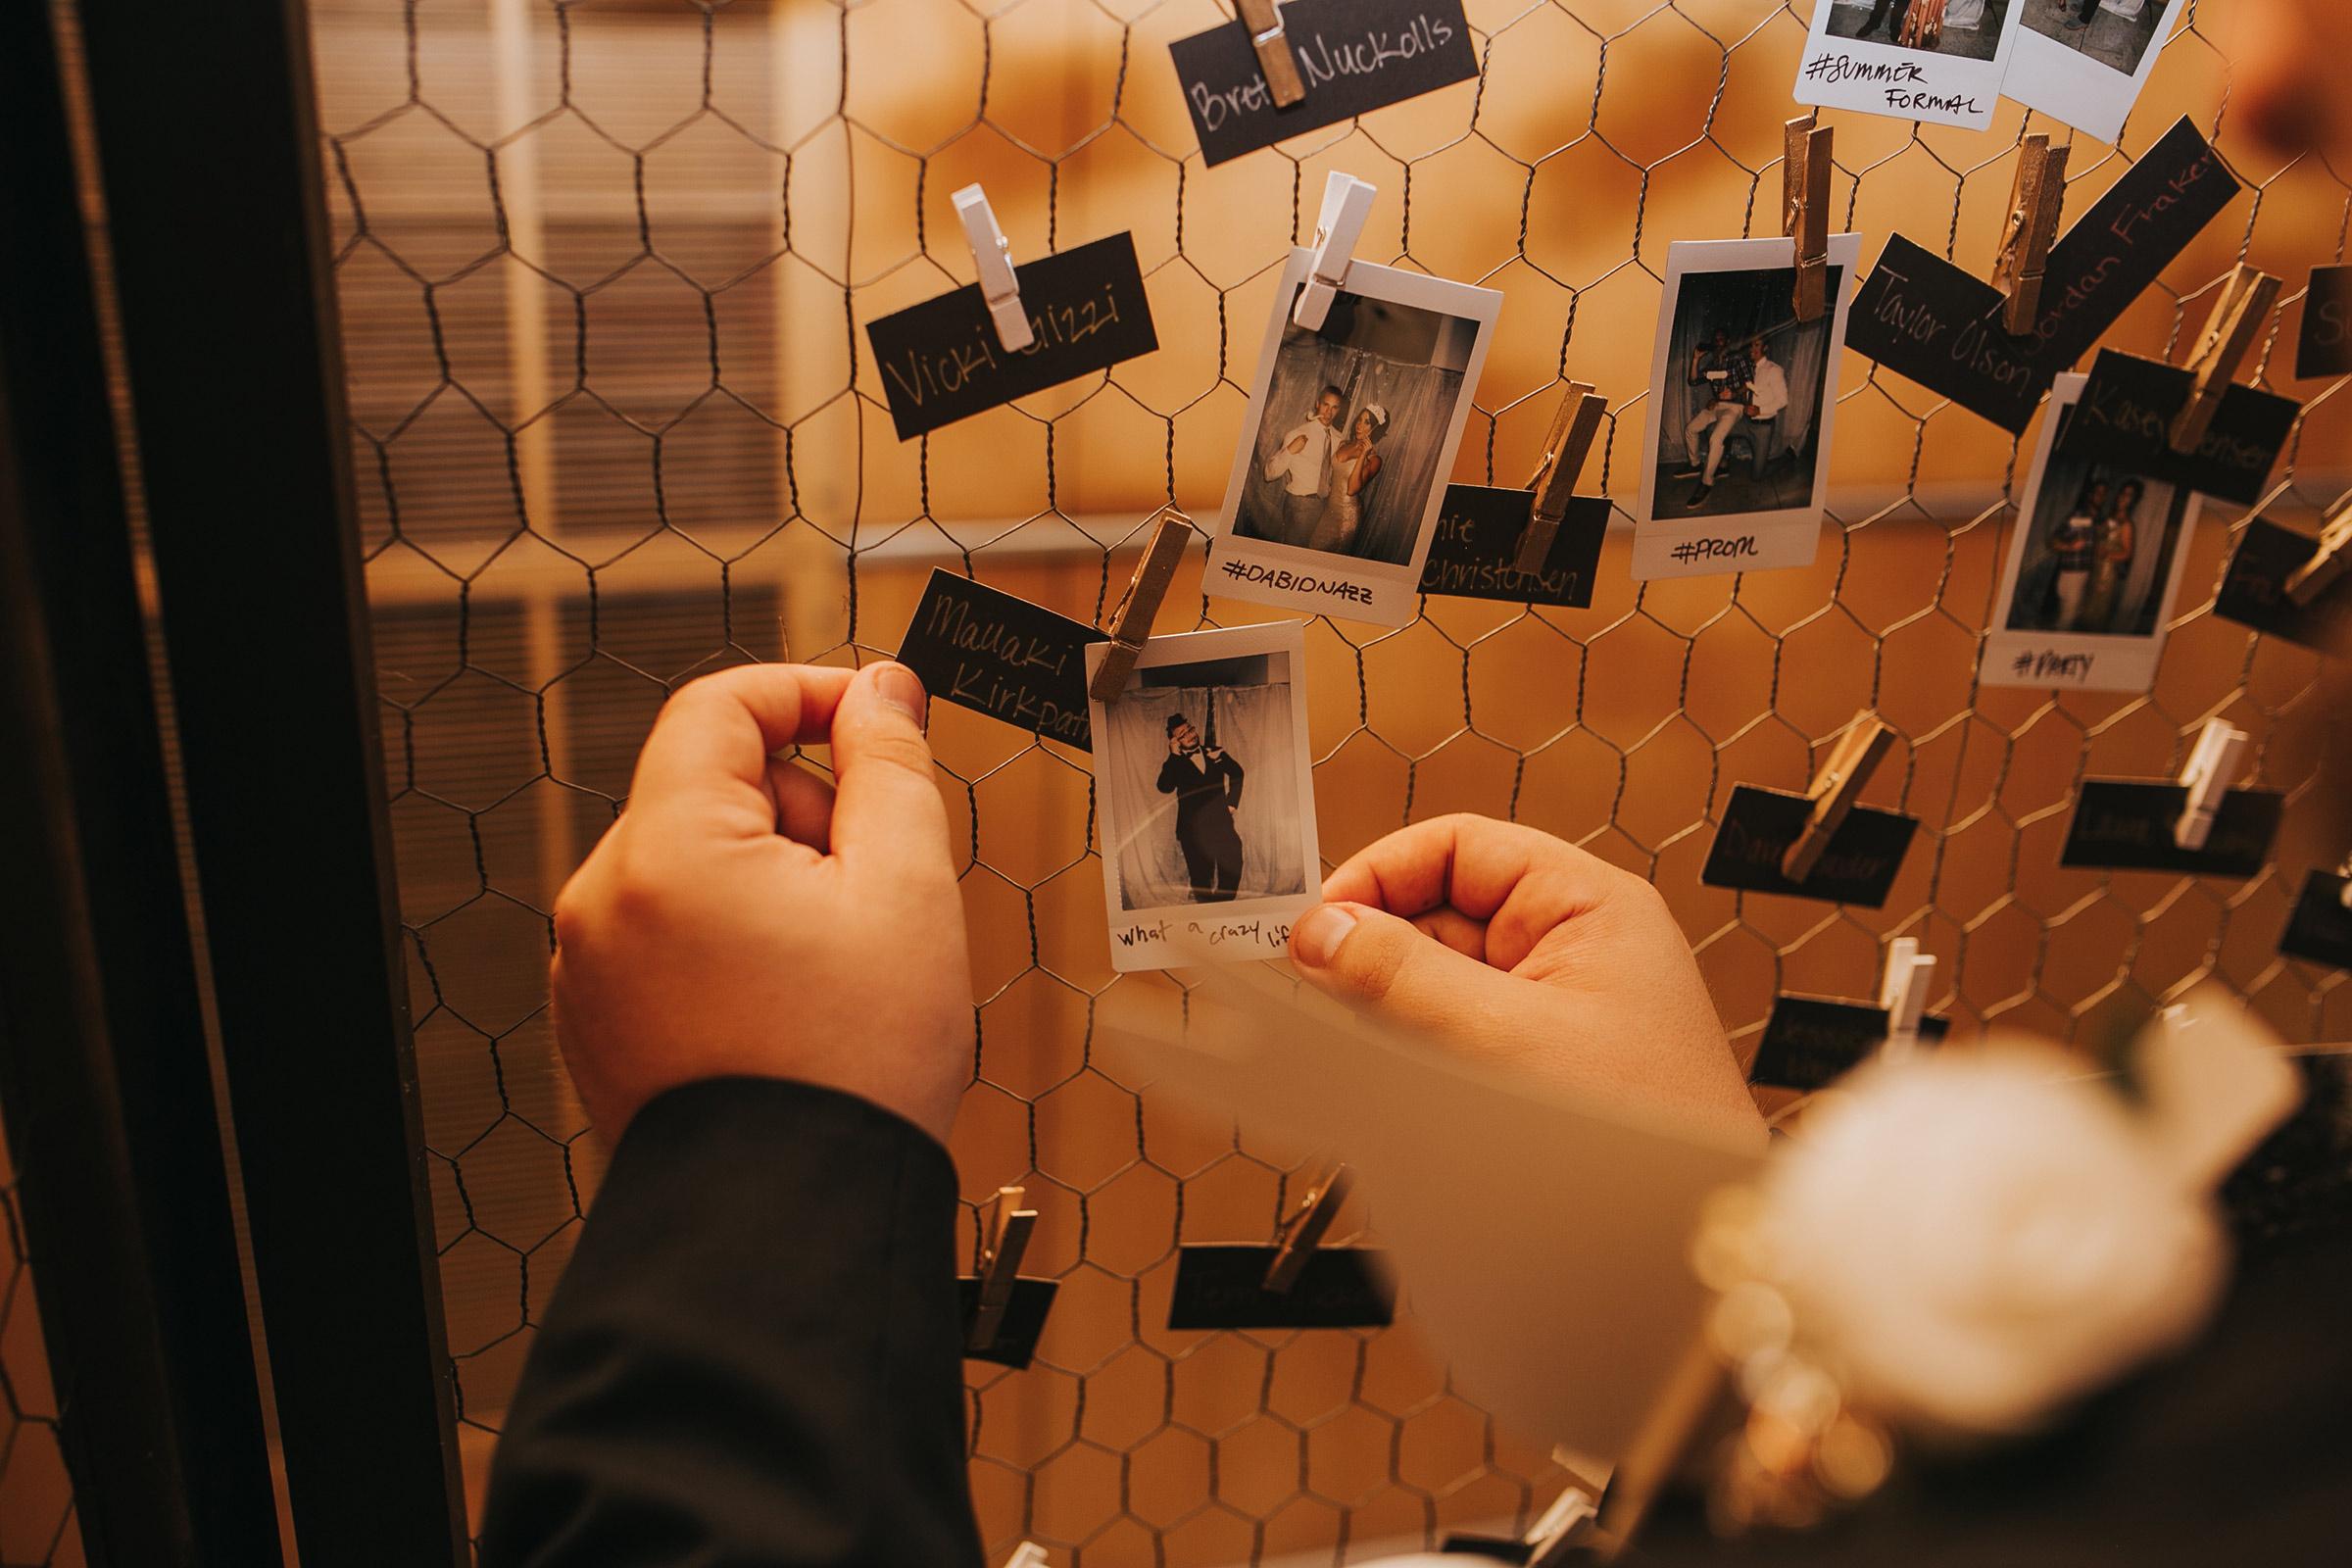 guest-hanging-polaroid-film-on-display-desmoines-iowa-art-center-raelyn-ramey-photography.jpg